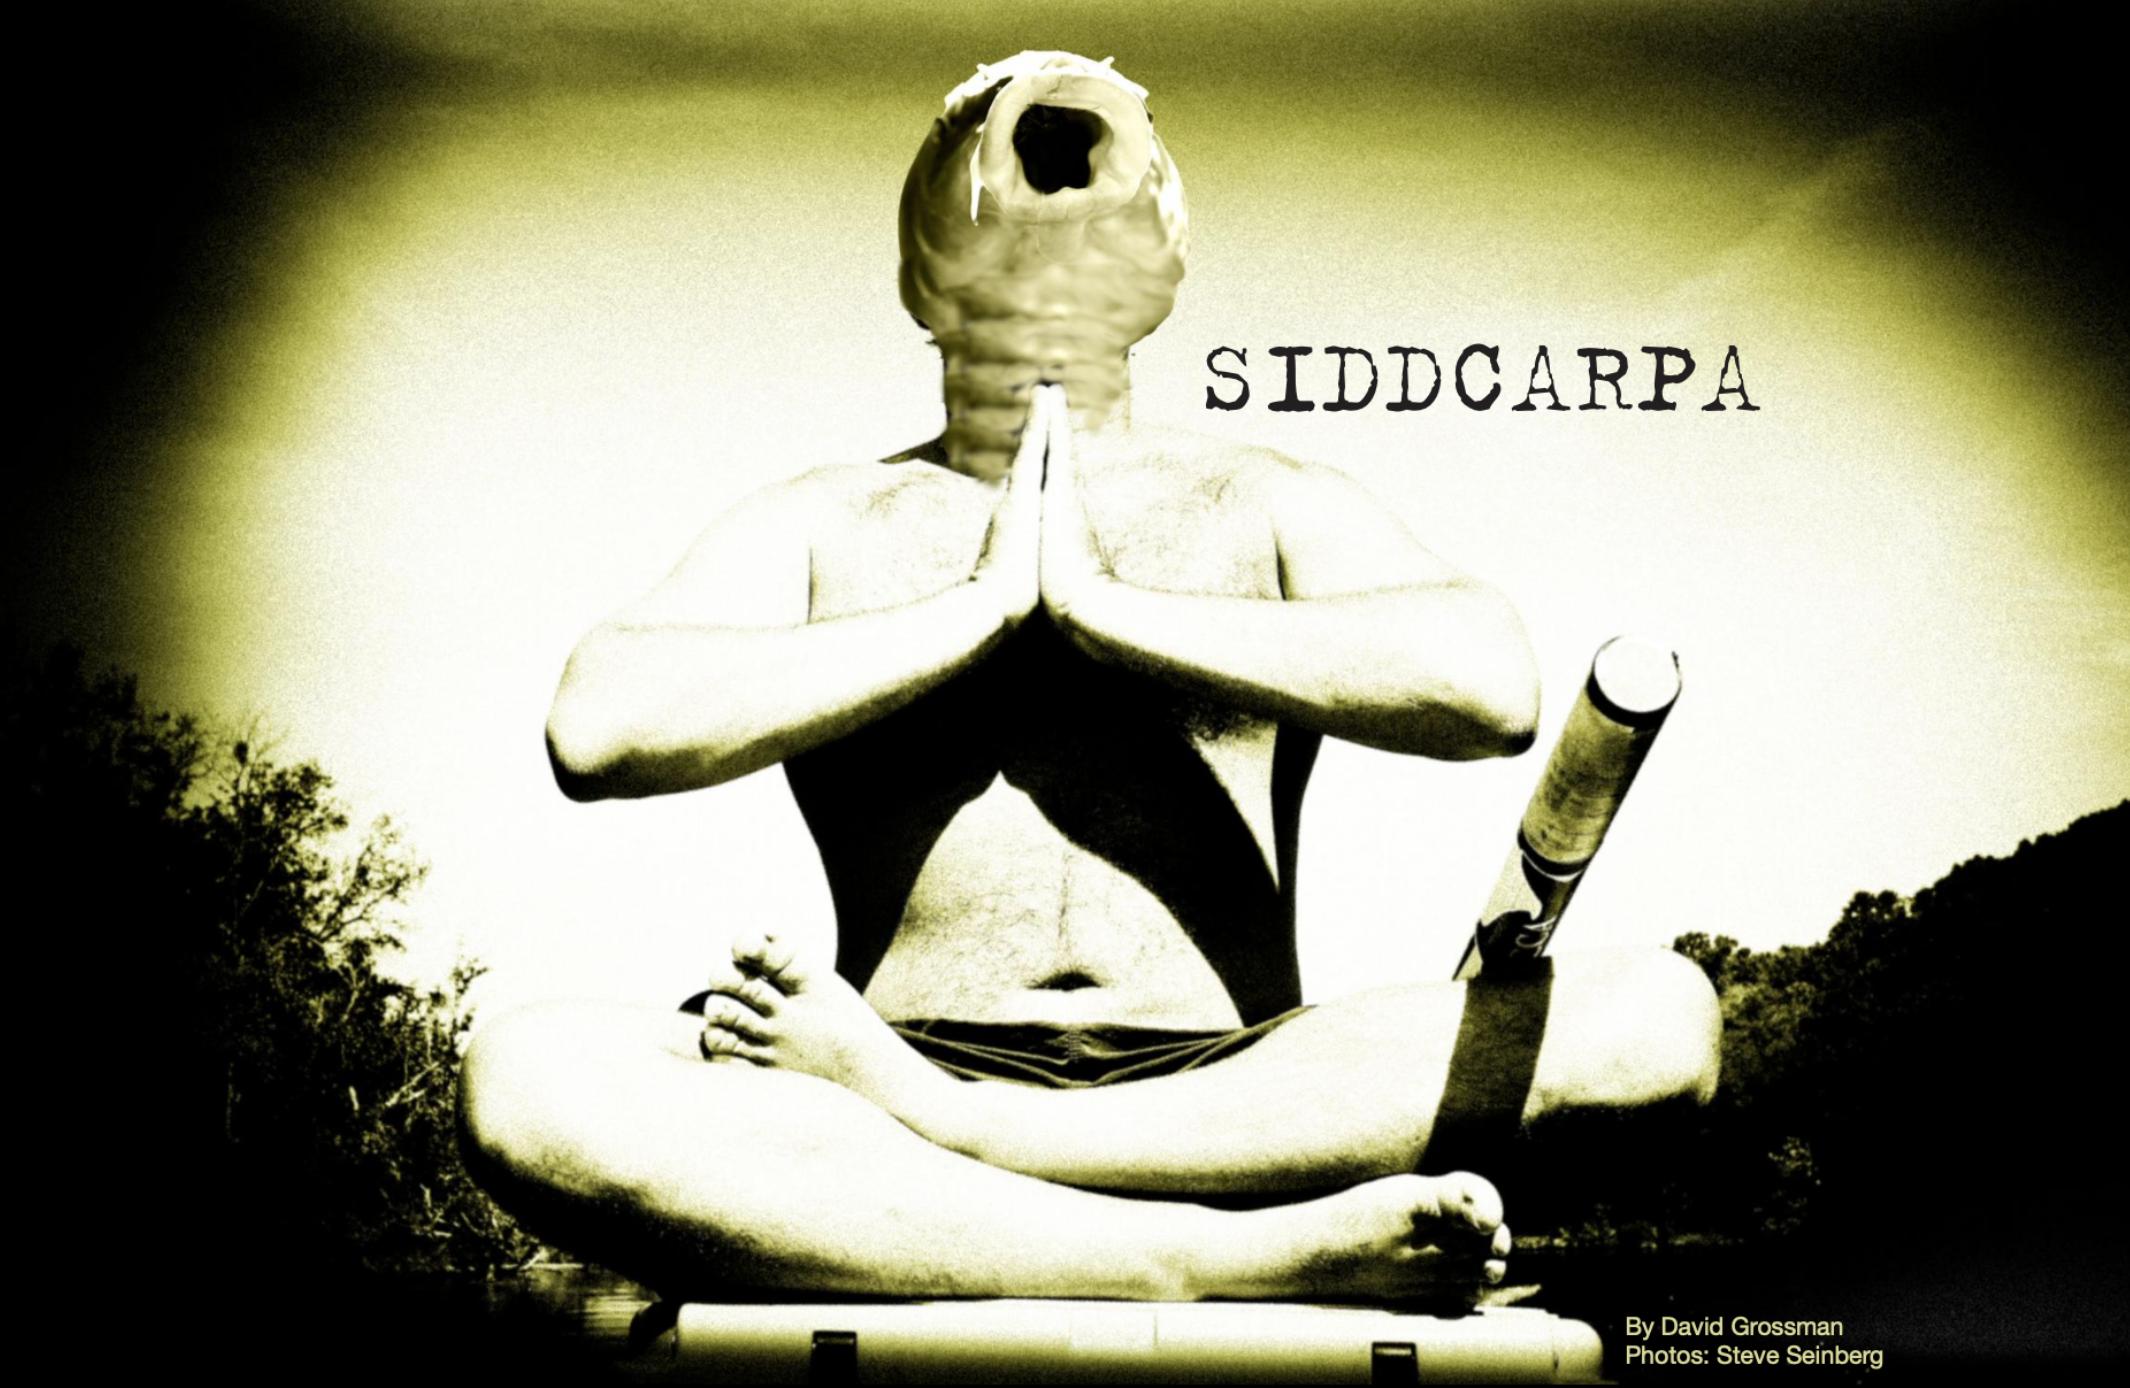 siddcarpa